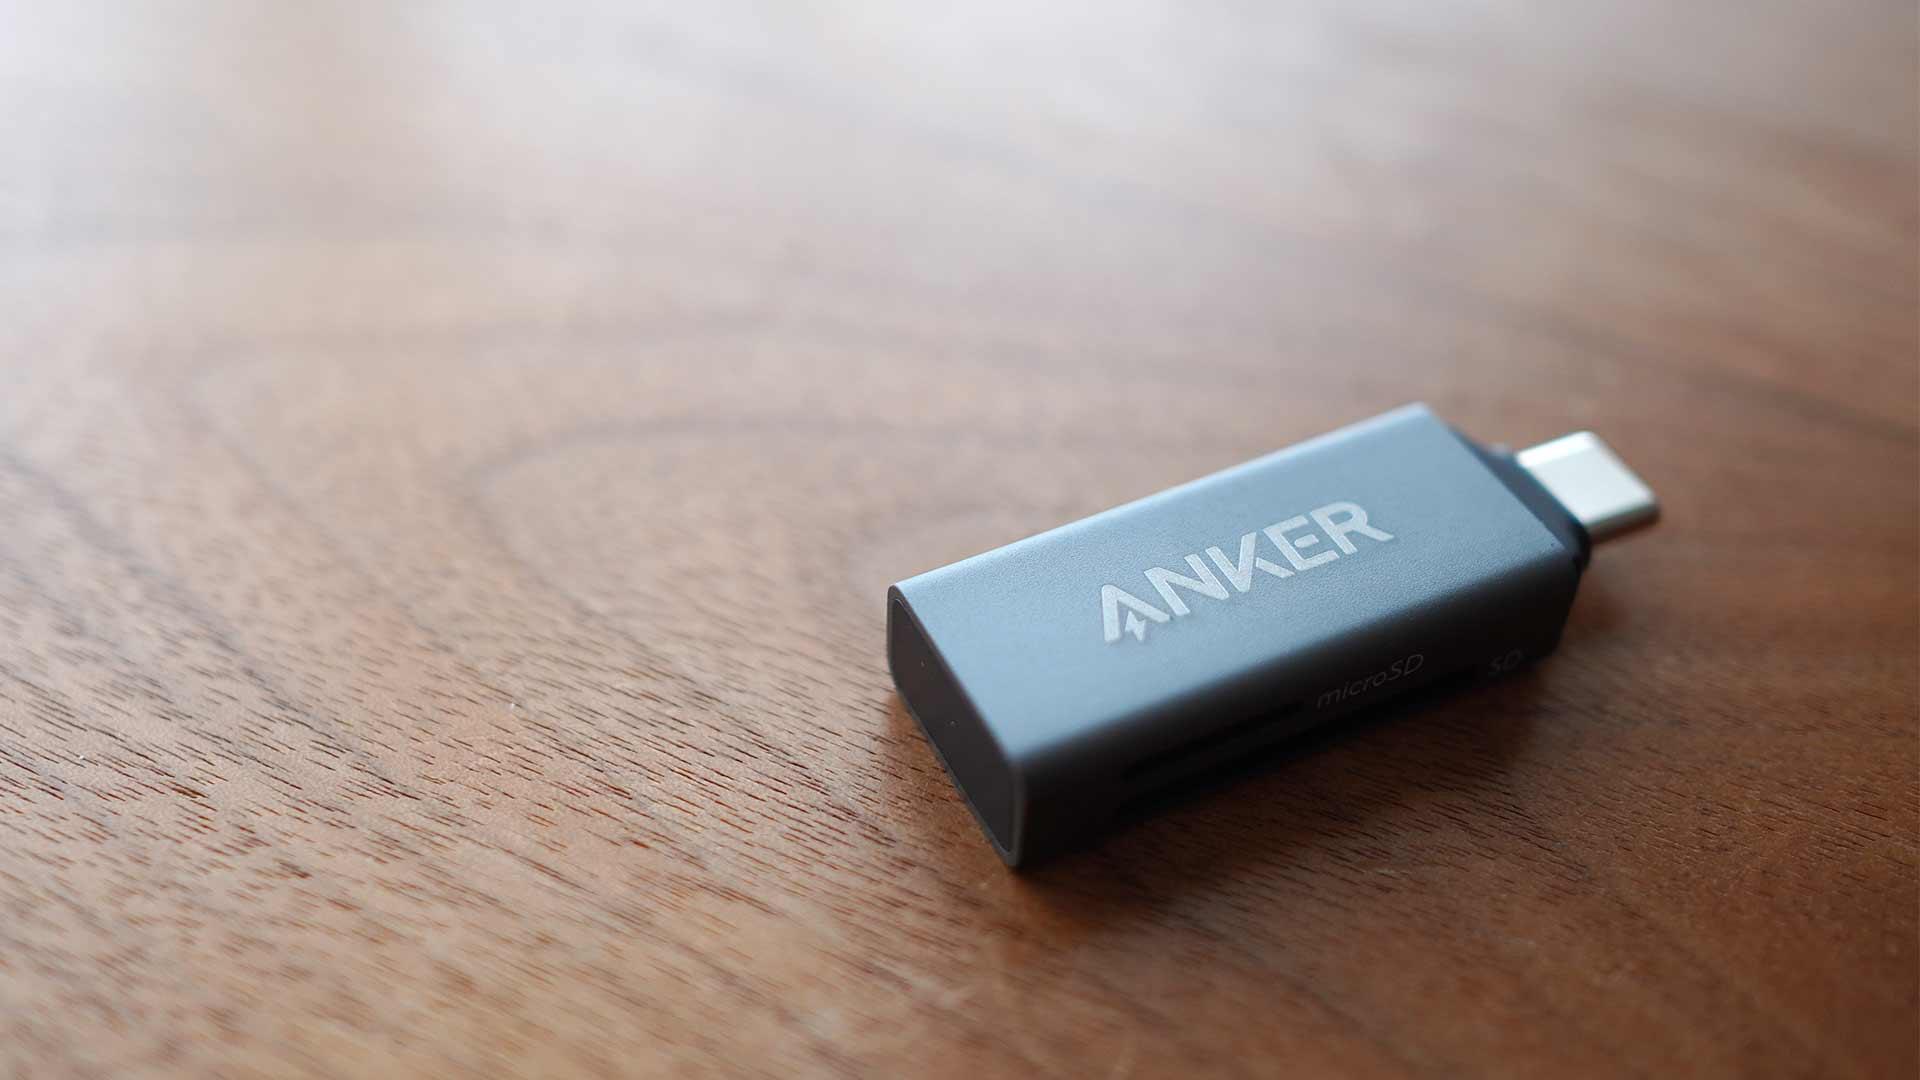 SDカードリーダー,メモリーカードリーダー,Anker,小さい,microsd,sd,お洒落